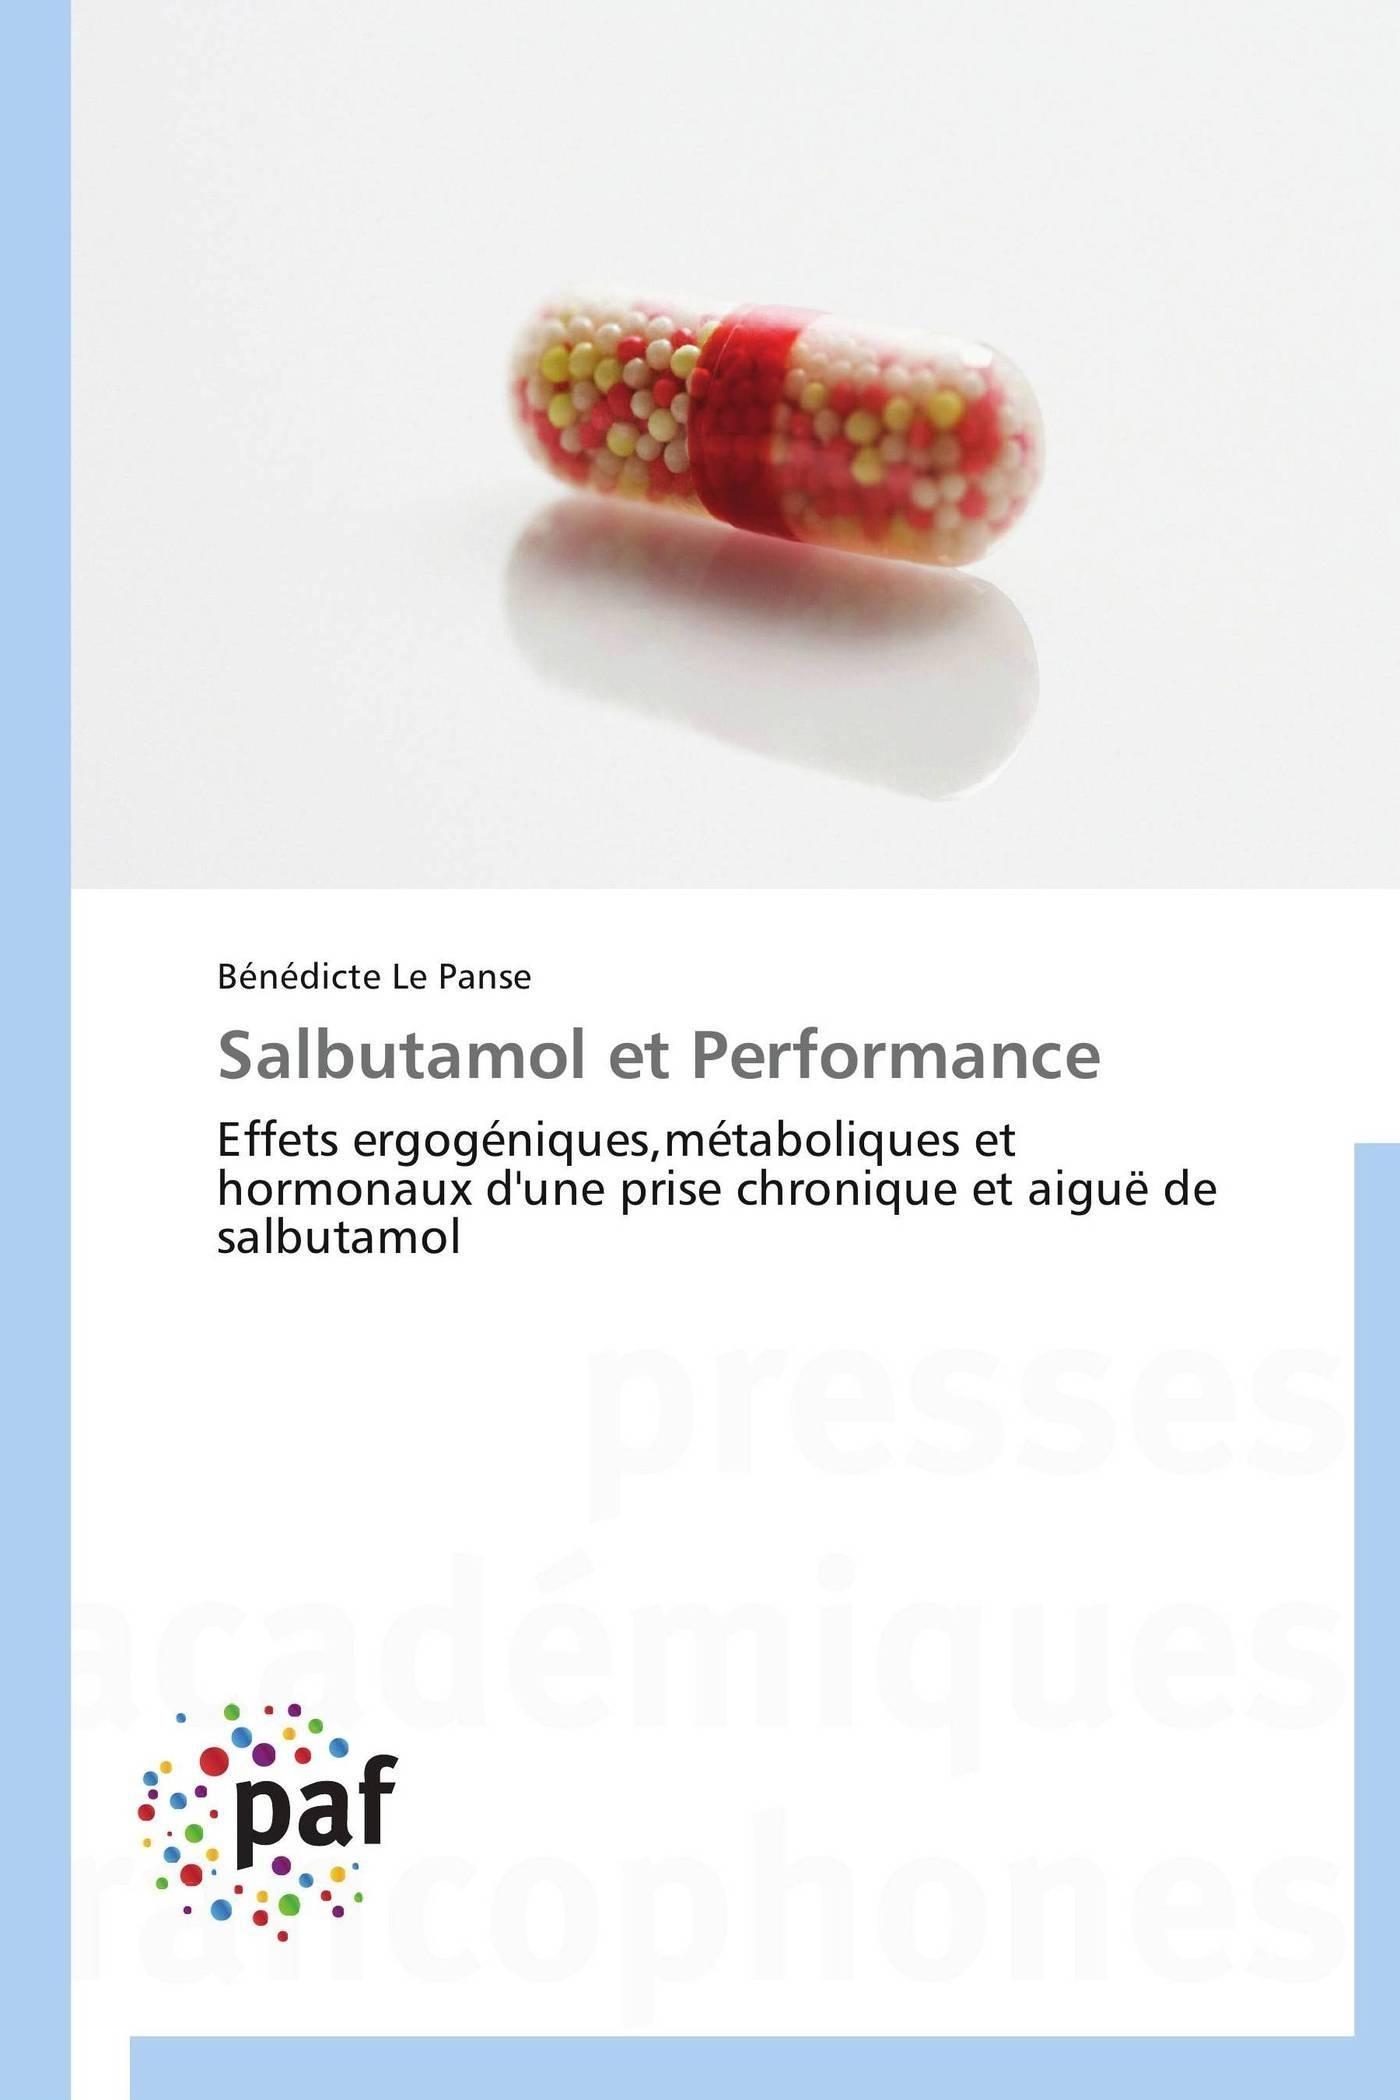 SALBUTAMOL ET PERFORMANCE